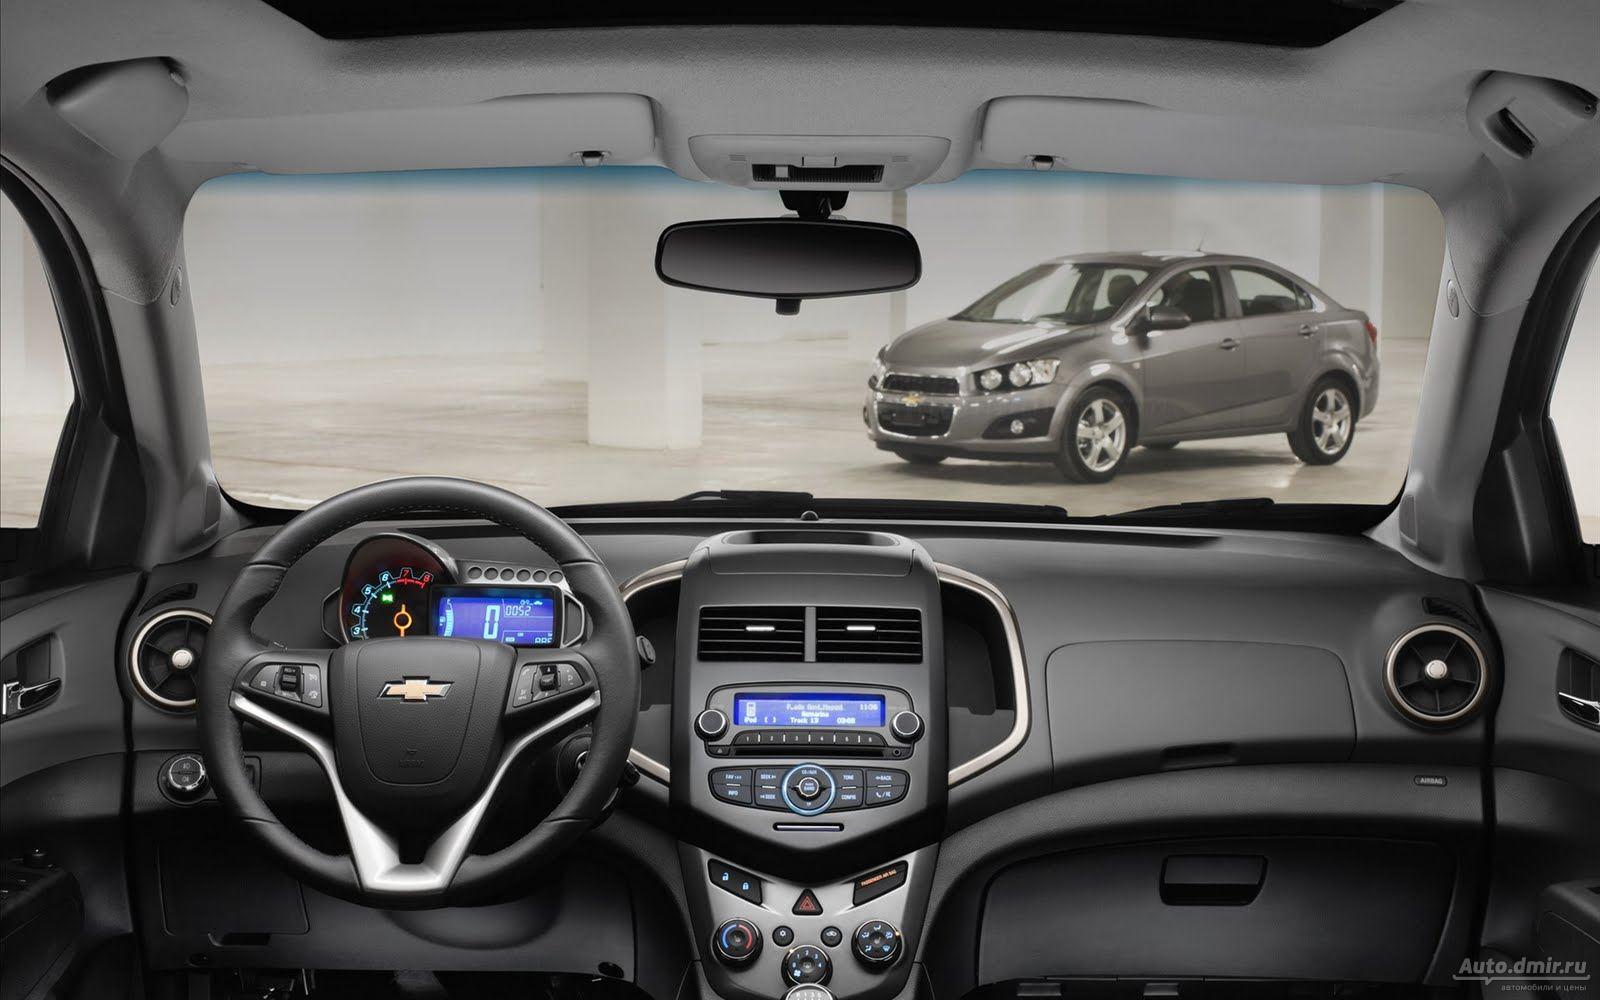 Chevrolet Aveo Dashboard View Car Hd Wallpaper